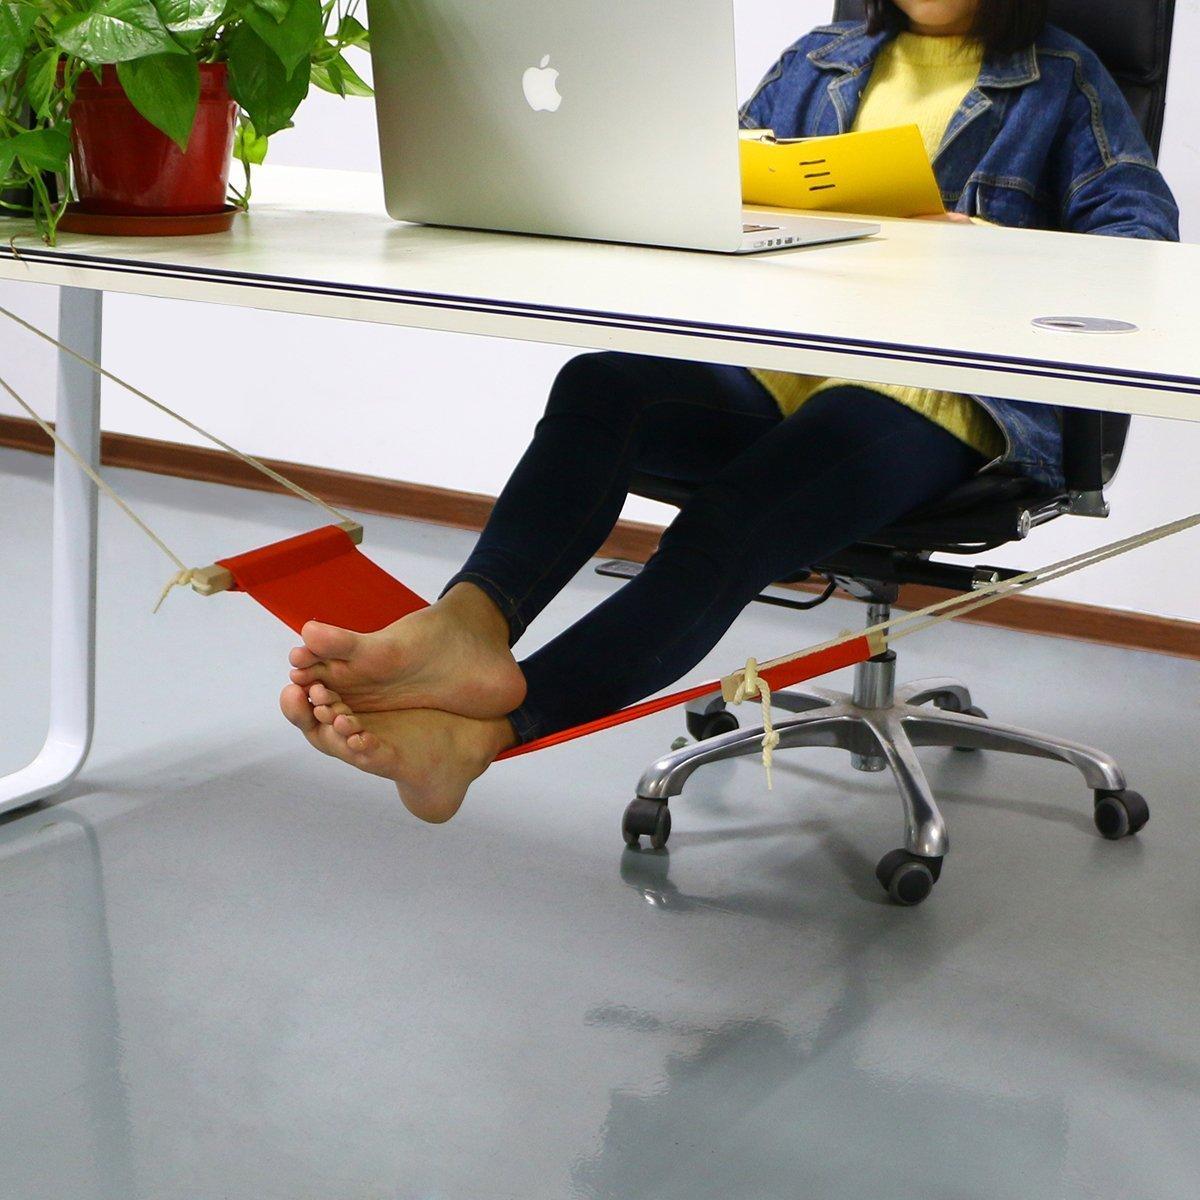 accmart adjustable mini foot rest stand office desk feet hammock orange  amazon co uk  office products accmart adjustable mini foot rest stand office desk feet hammock      rh   amazon co uk